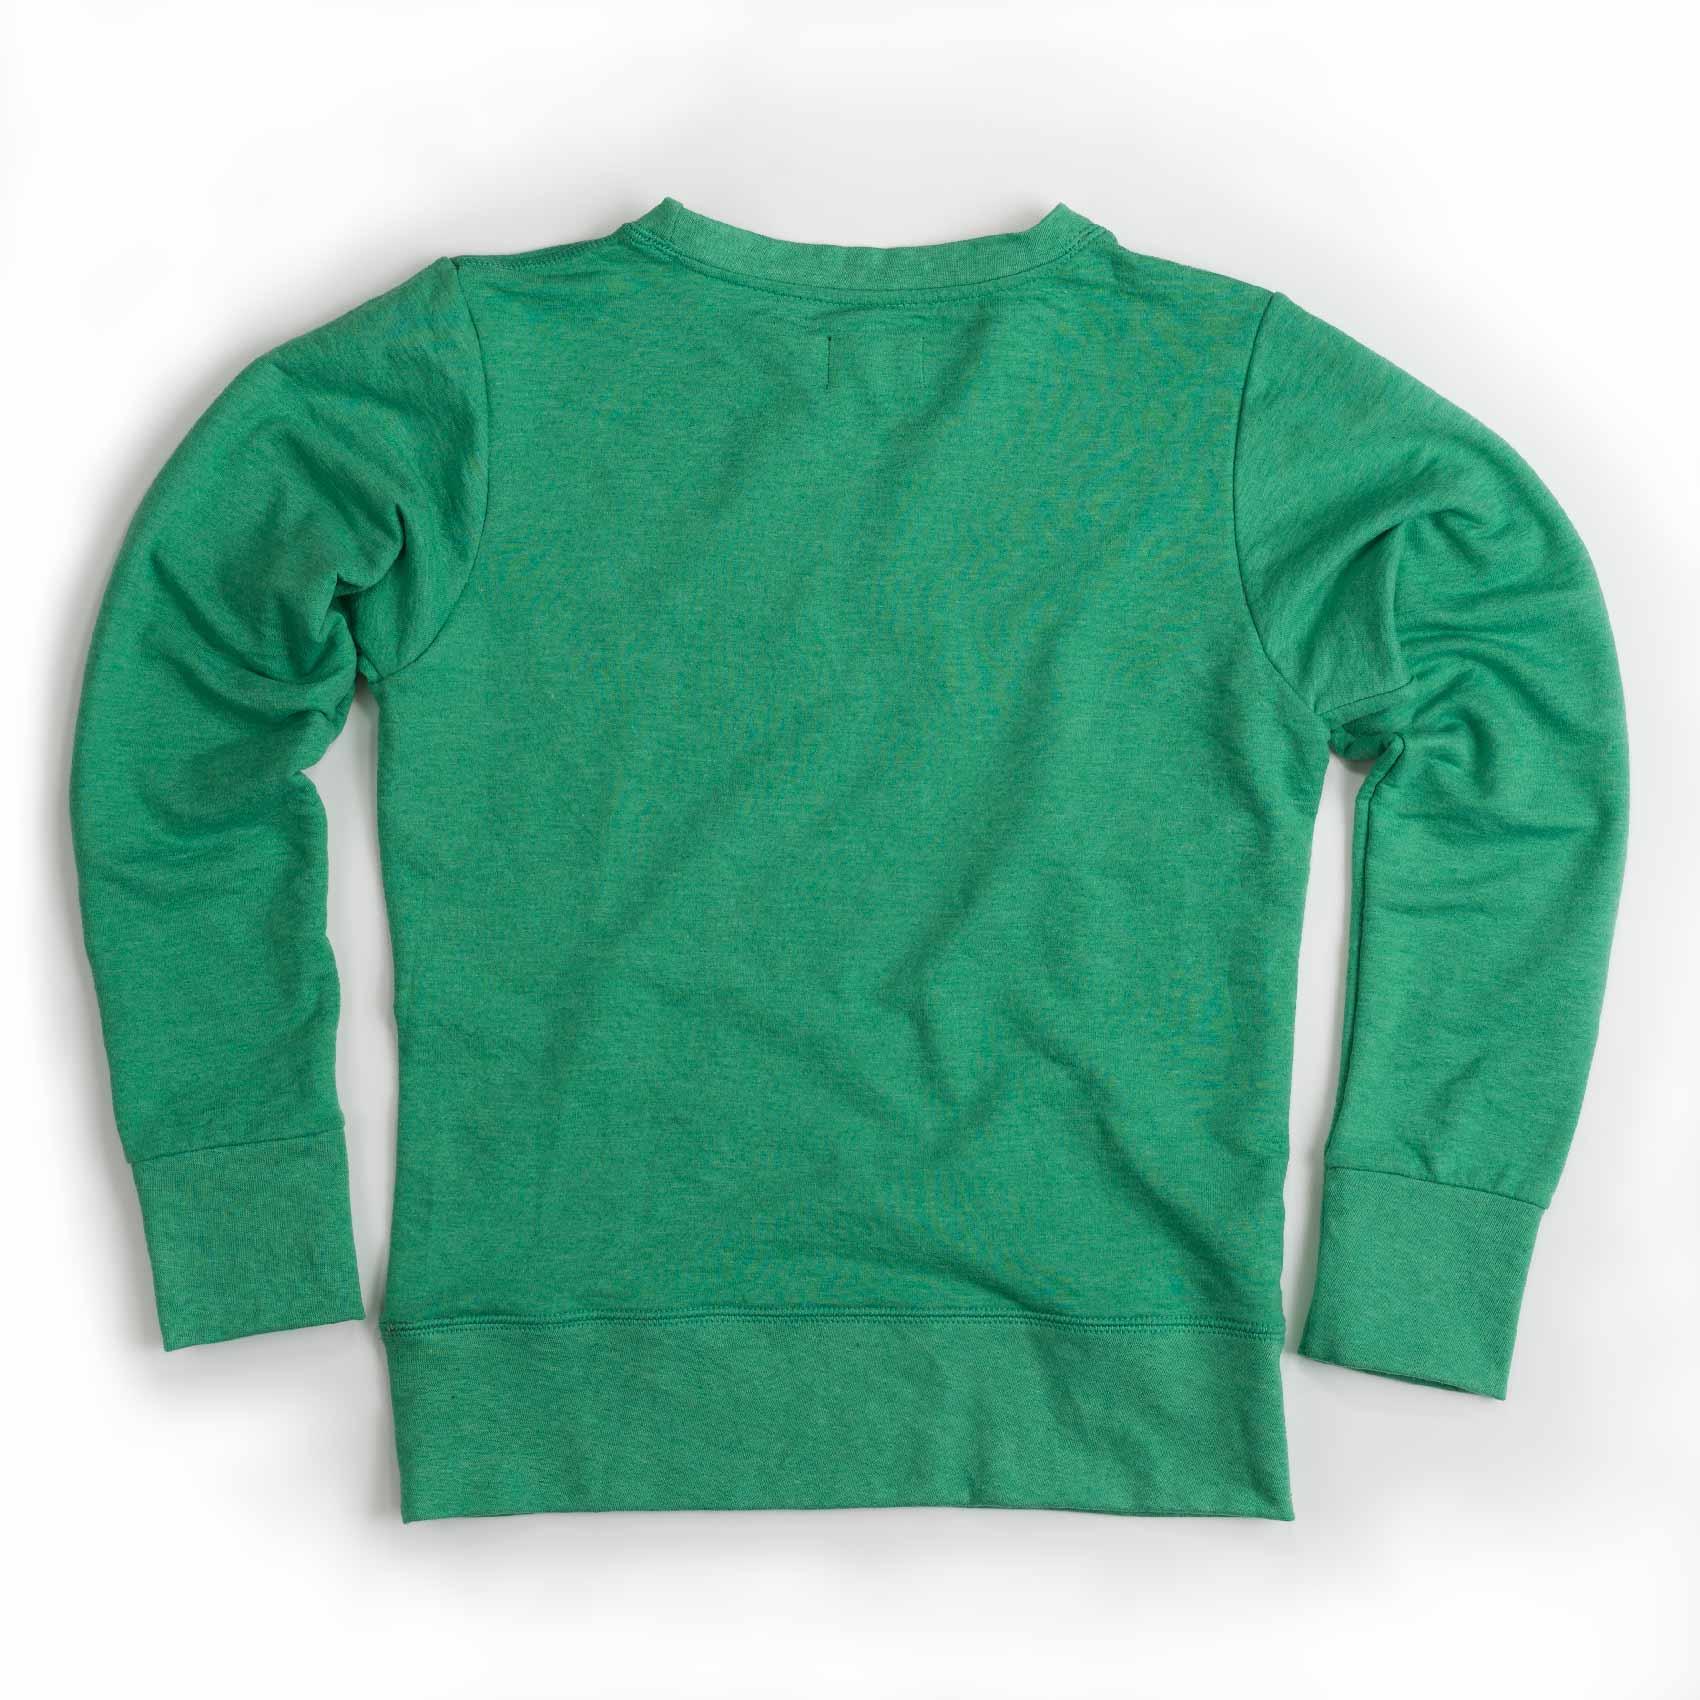 PM green sweatshirt back